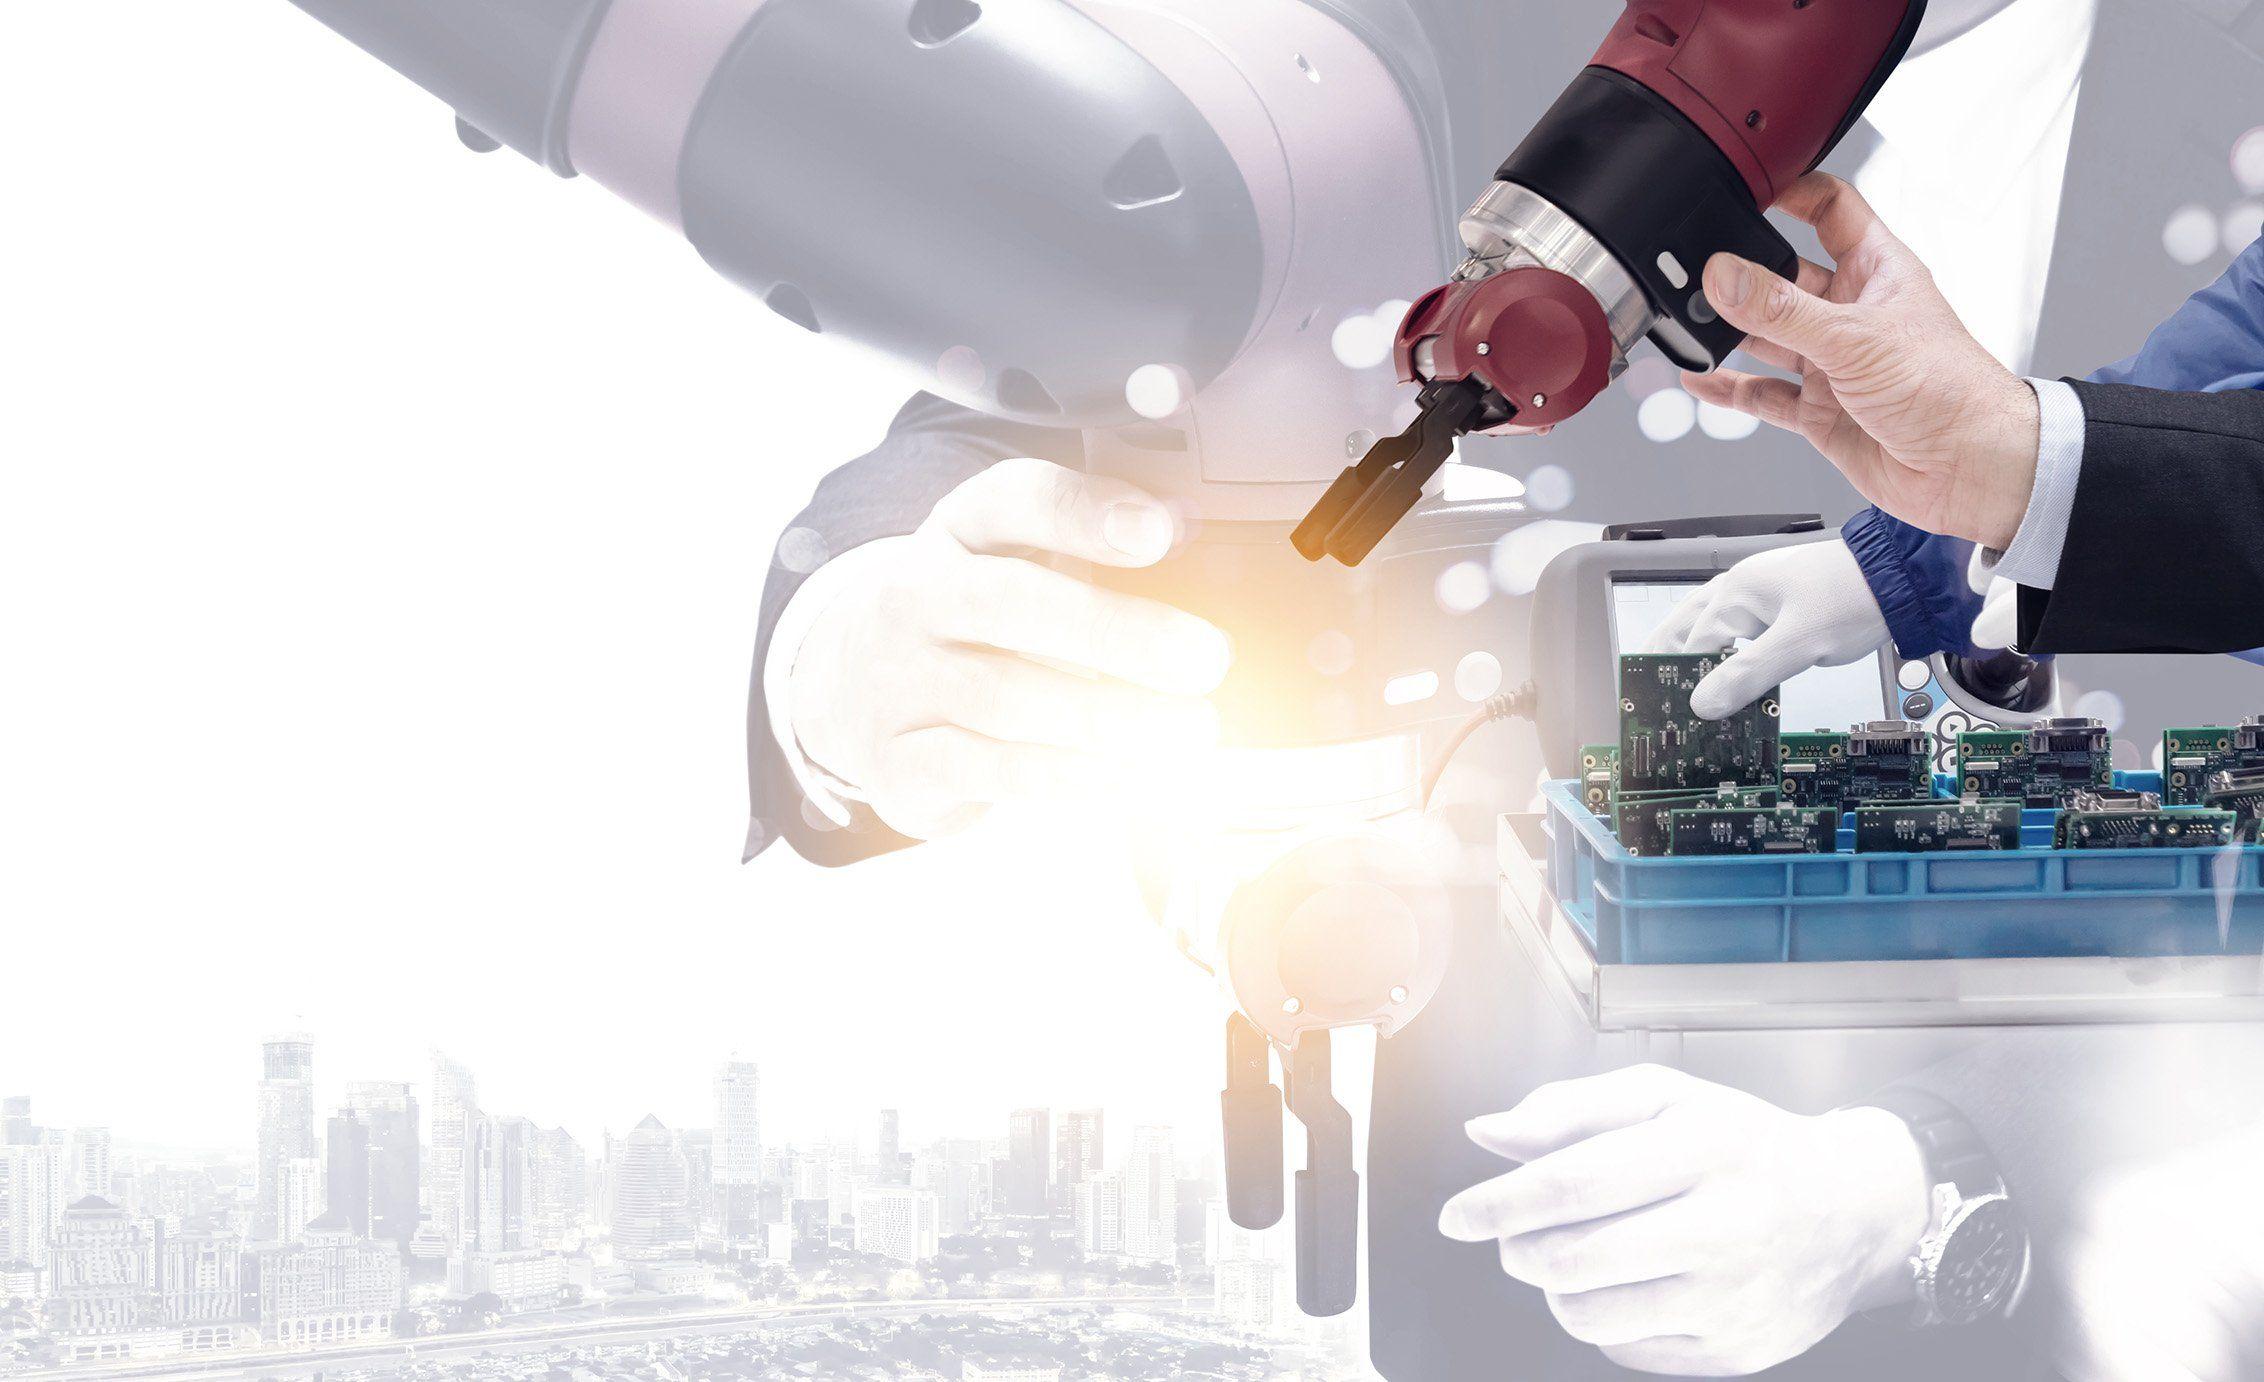 Collaborative robots help manufacturers address worker